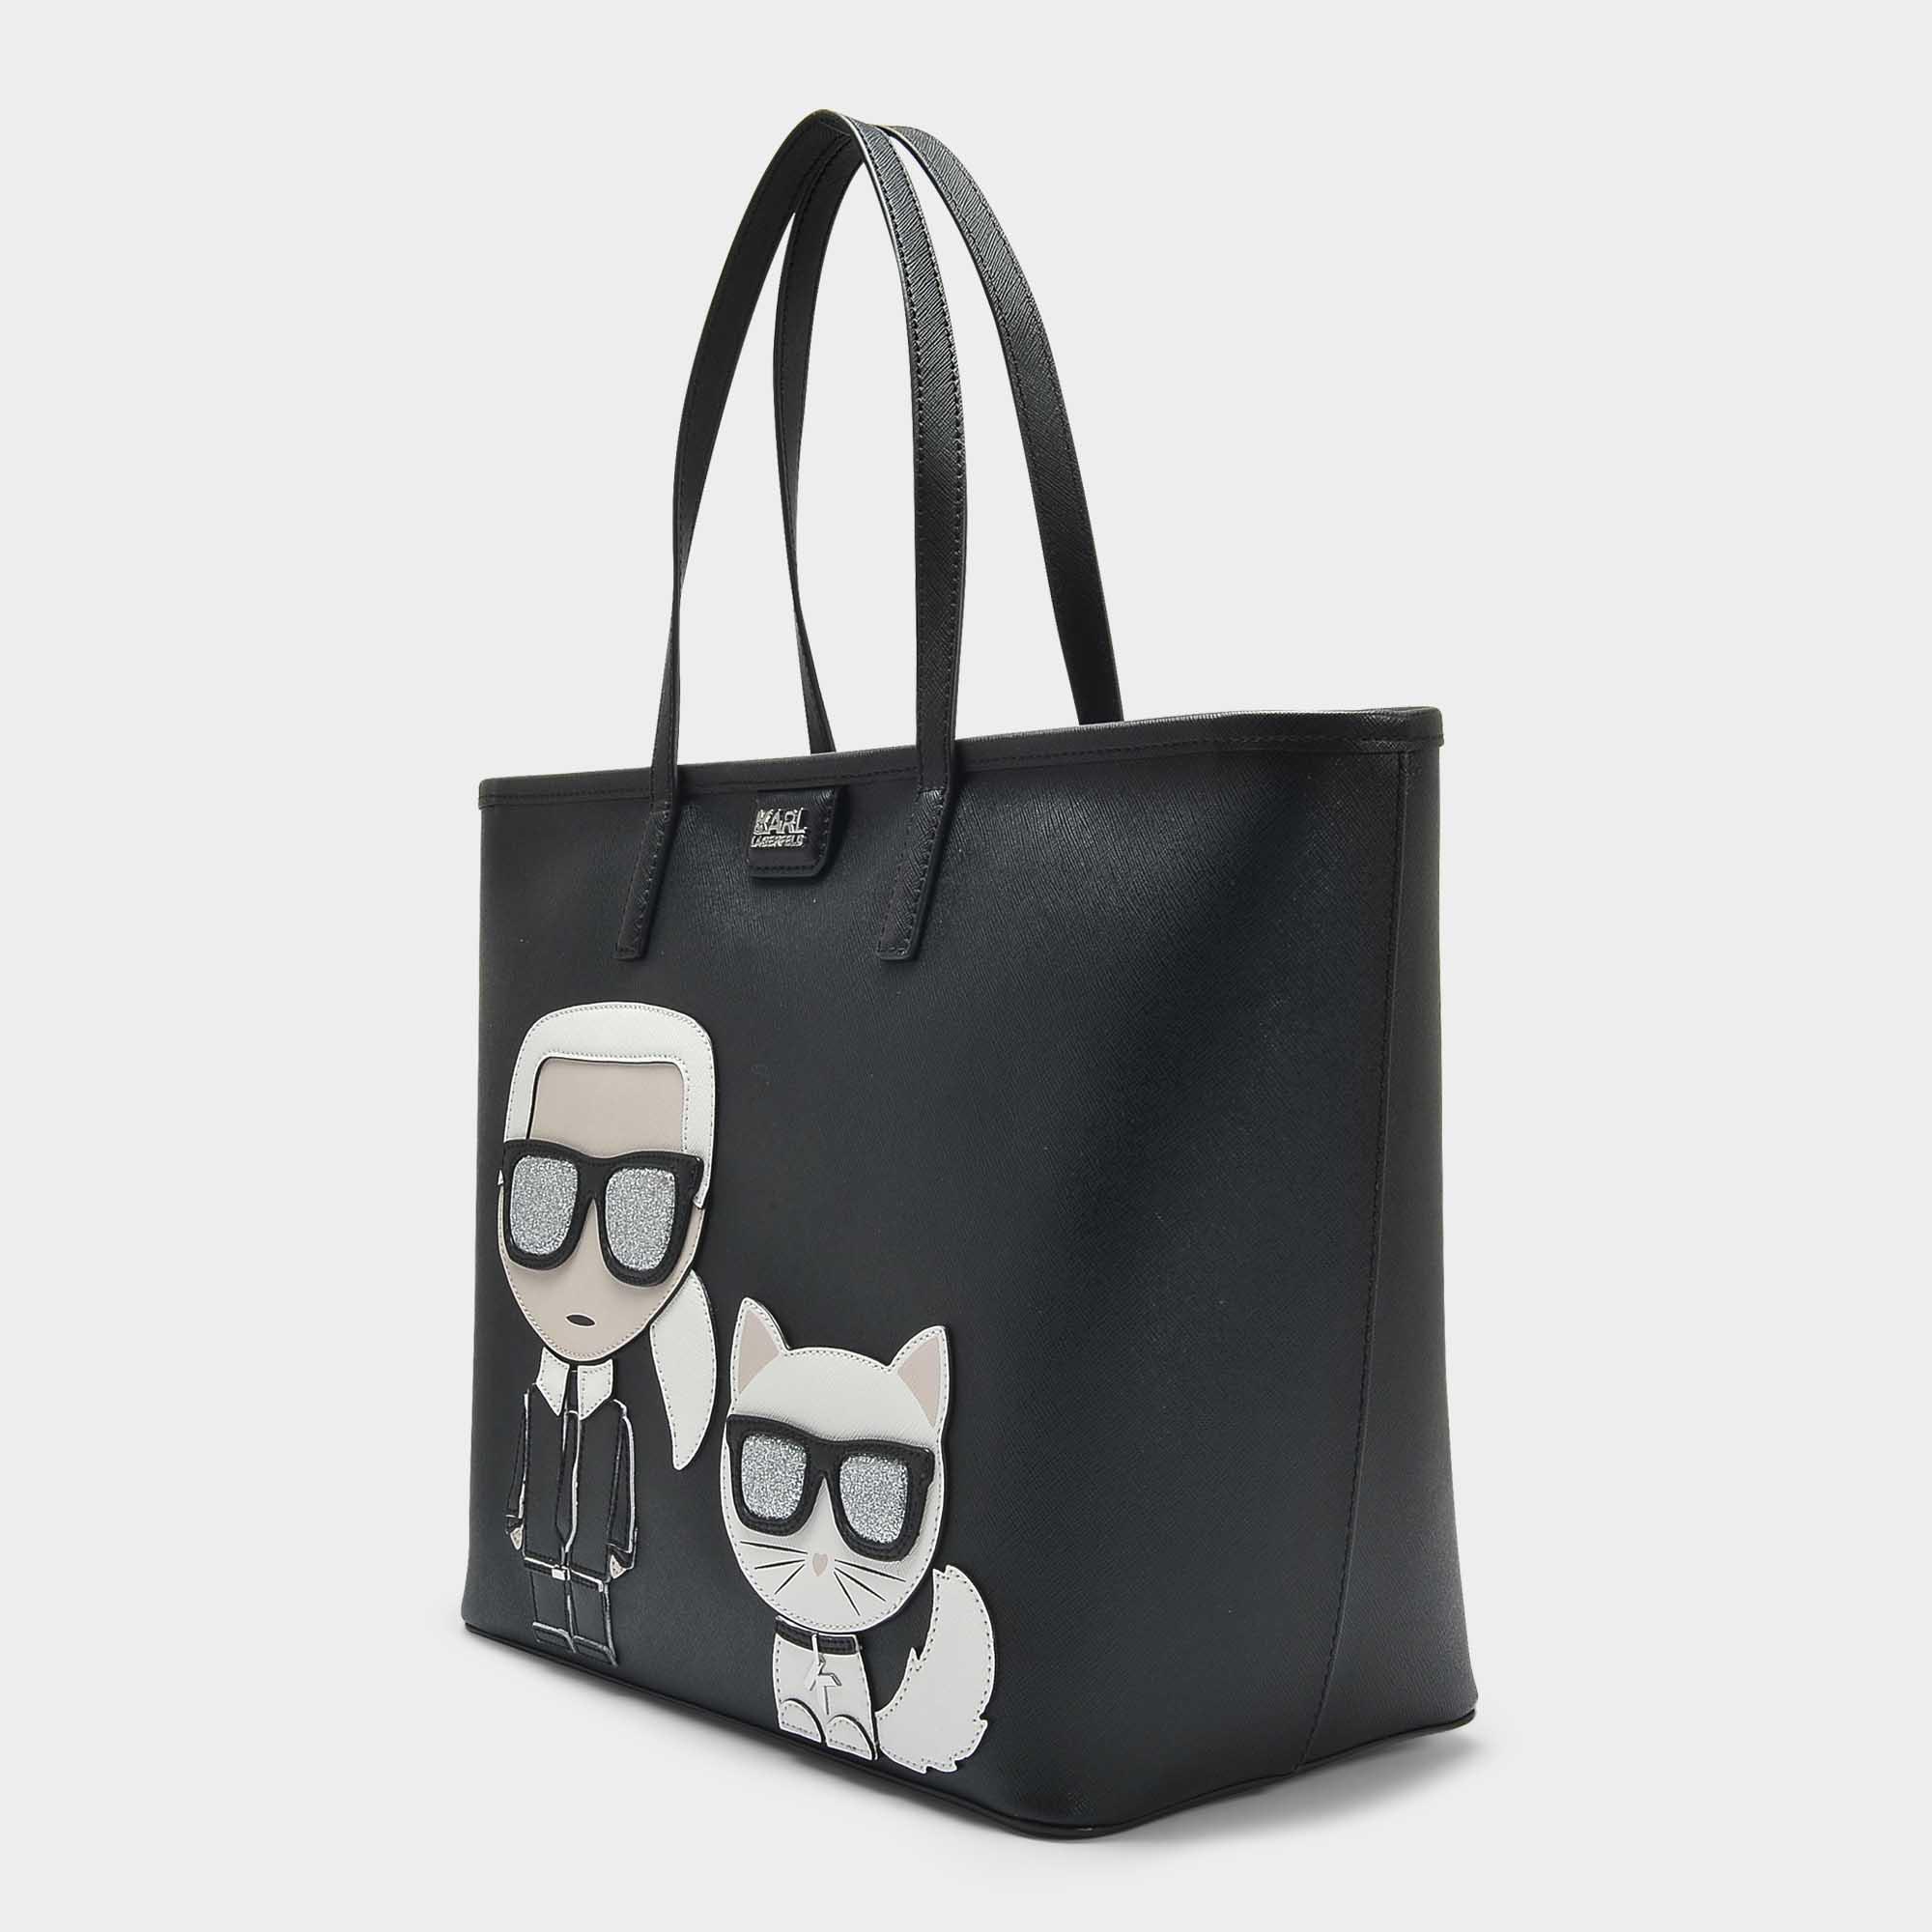 K/Ikonik Shopper Bag in Black Technical Saffiano Karl Lagerfeld O2ROVn